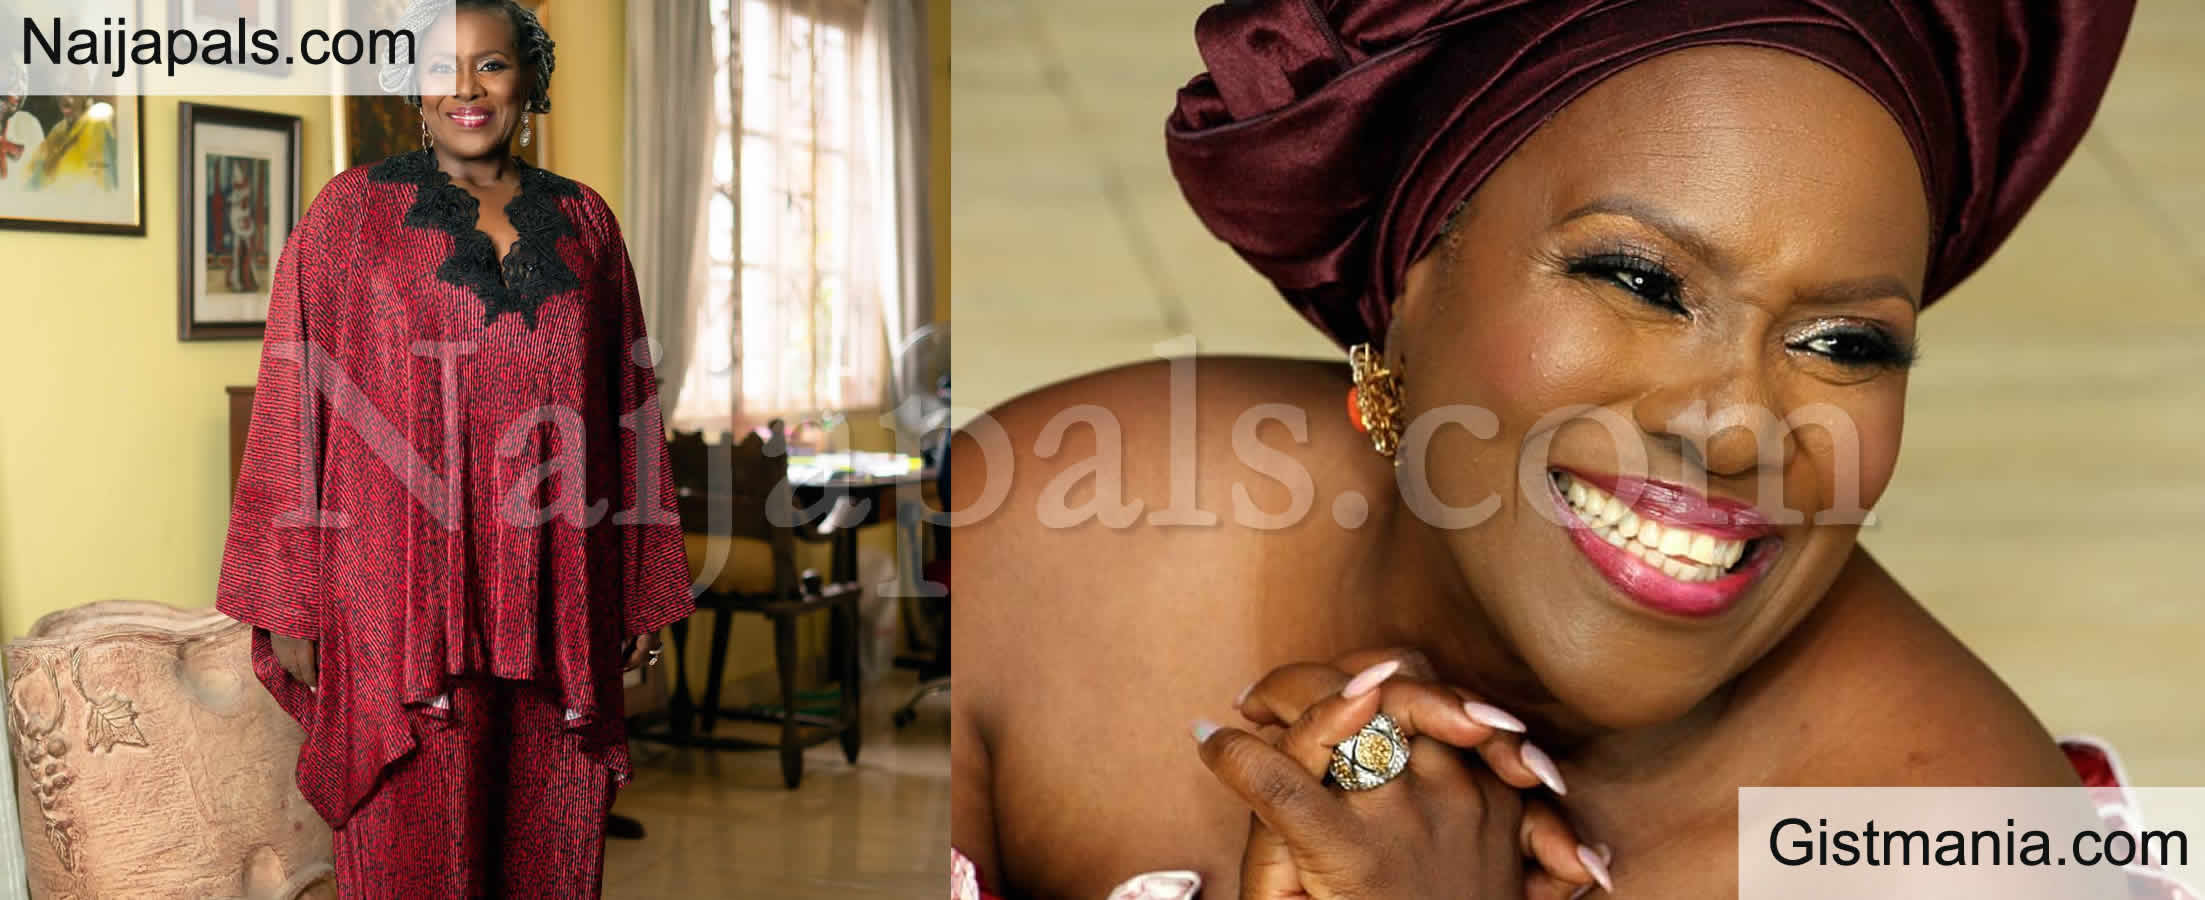 <img alt='.' class='lazyload' data-src='https://img.gistmania.com/emot/cake.png' /><img alt='.' class='lazyload' data-src='https://img.gistmania.com/emot/photo.png' /> <b>Veteran Actress, Joke Silva Looks Stunning As She Celebrates 59th Birthday</b>